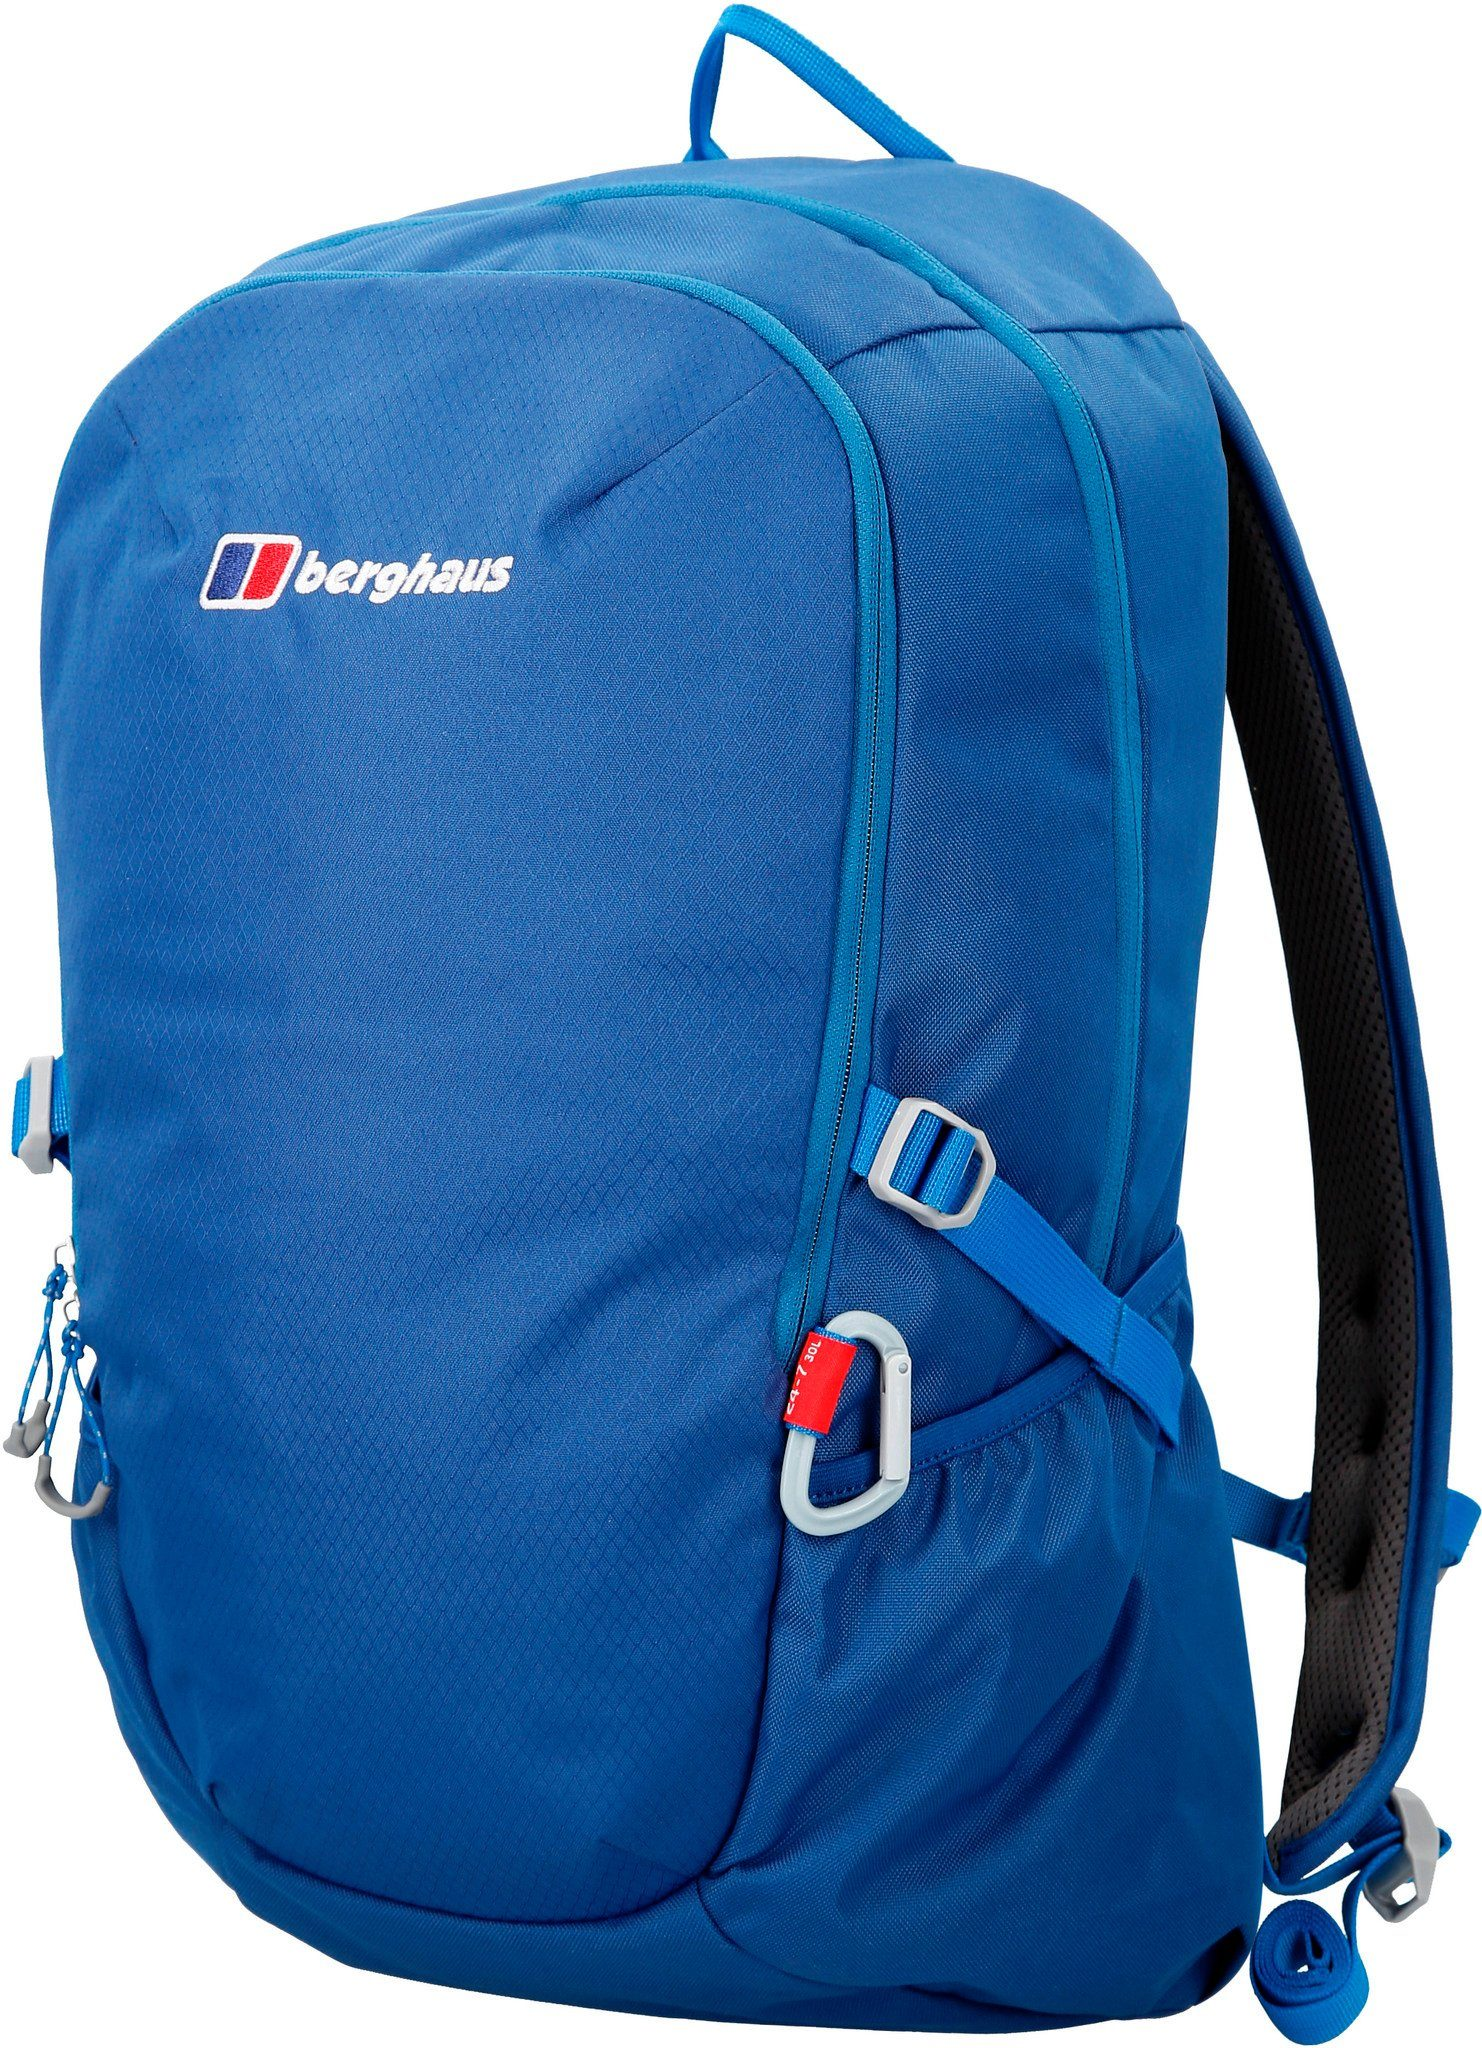 Berghaus Wanderrucksack »Twentyfourseven 30 Backpack«